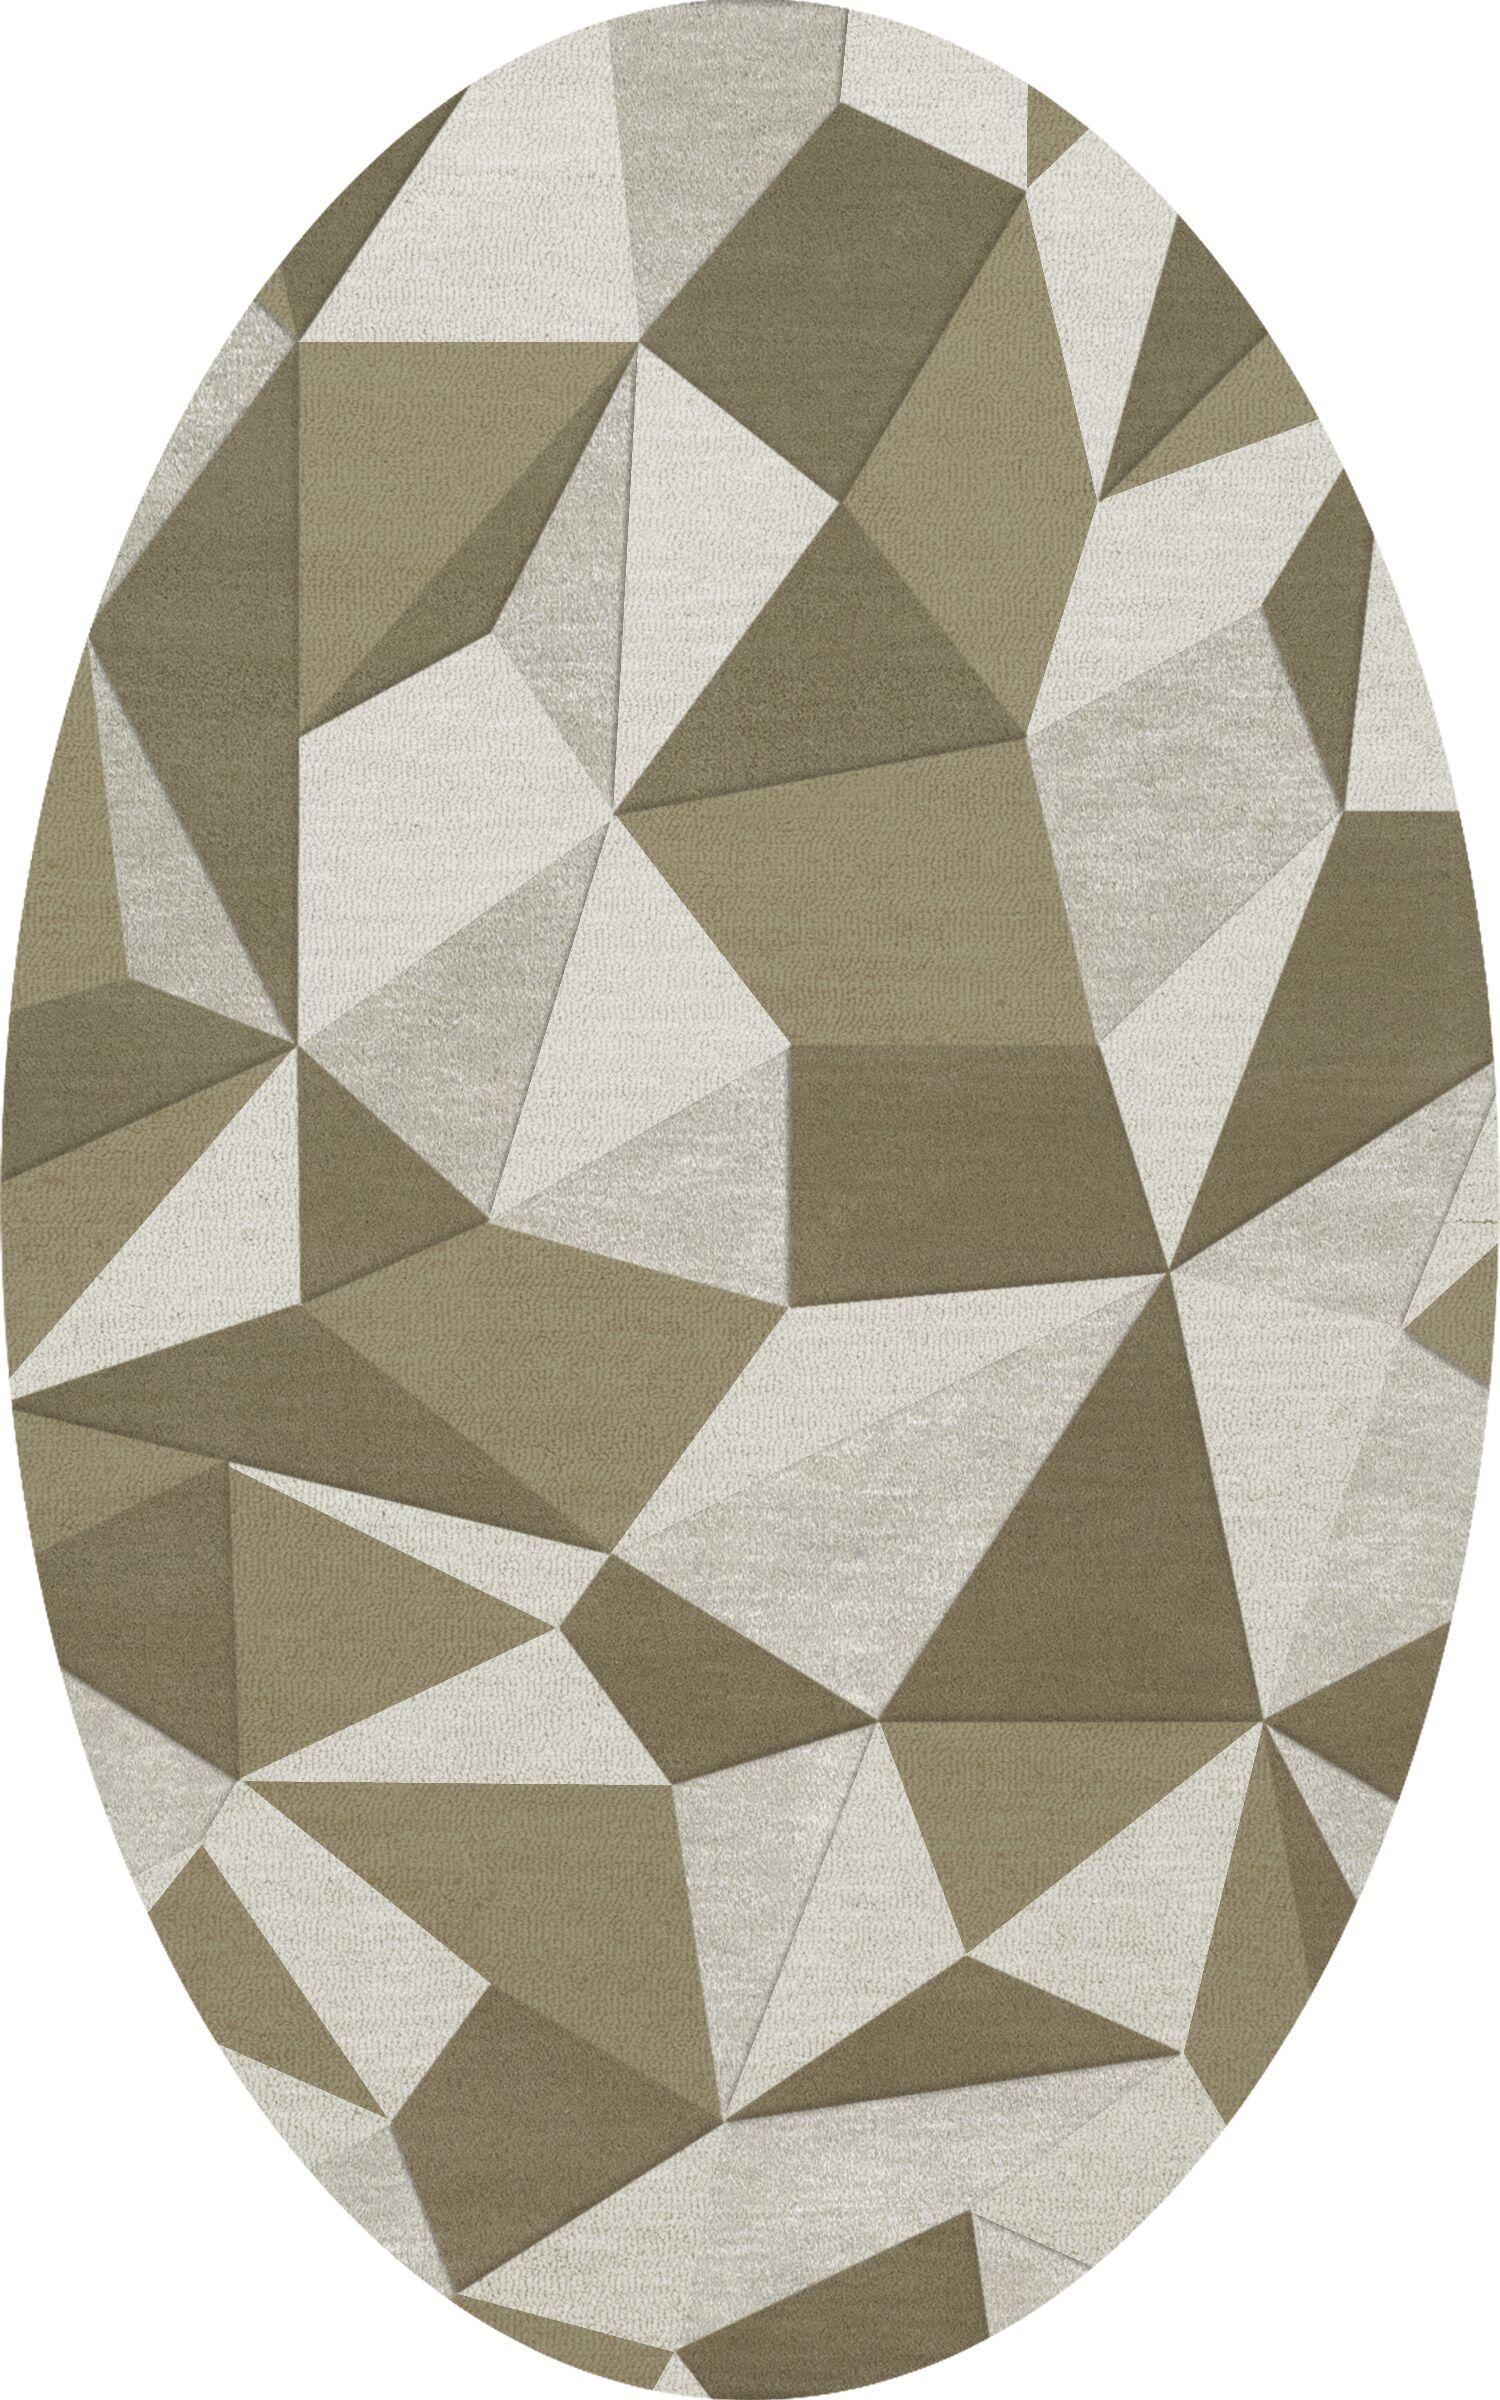 Bella Machine Woven Wool Beige/Gray Area Rug Rug Size: Oval 5' x 8'